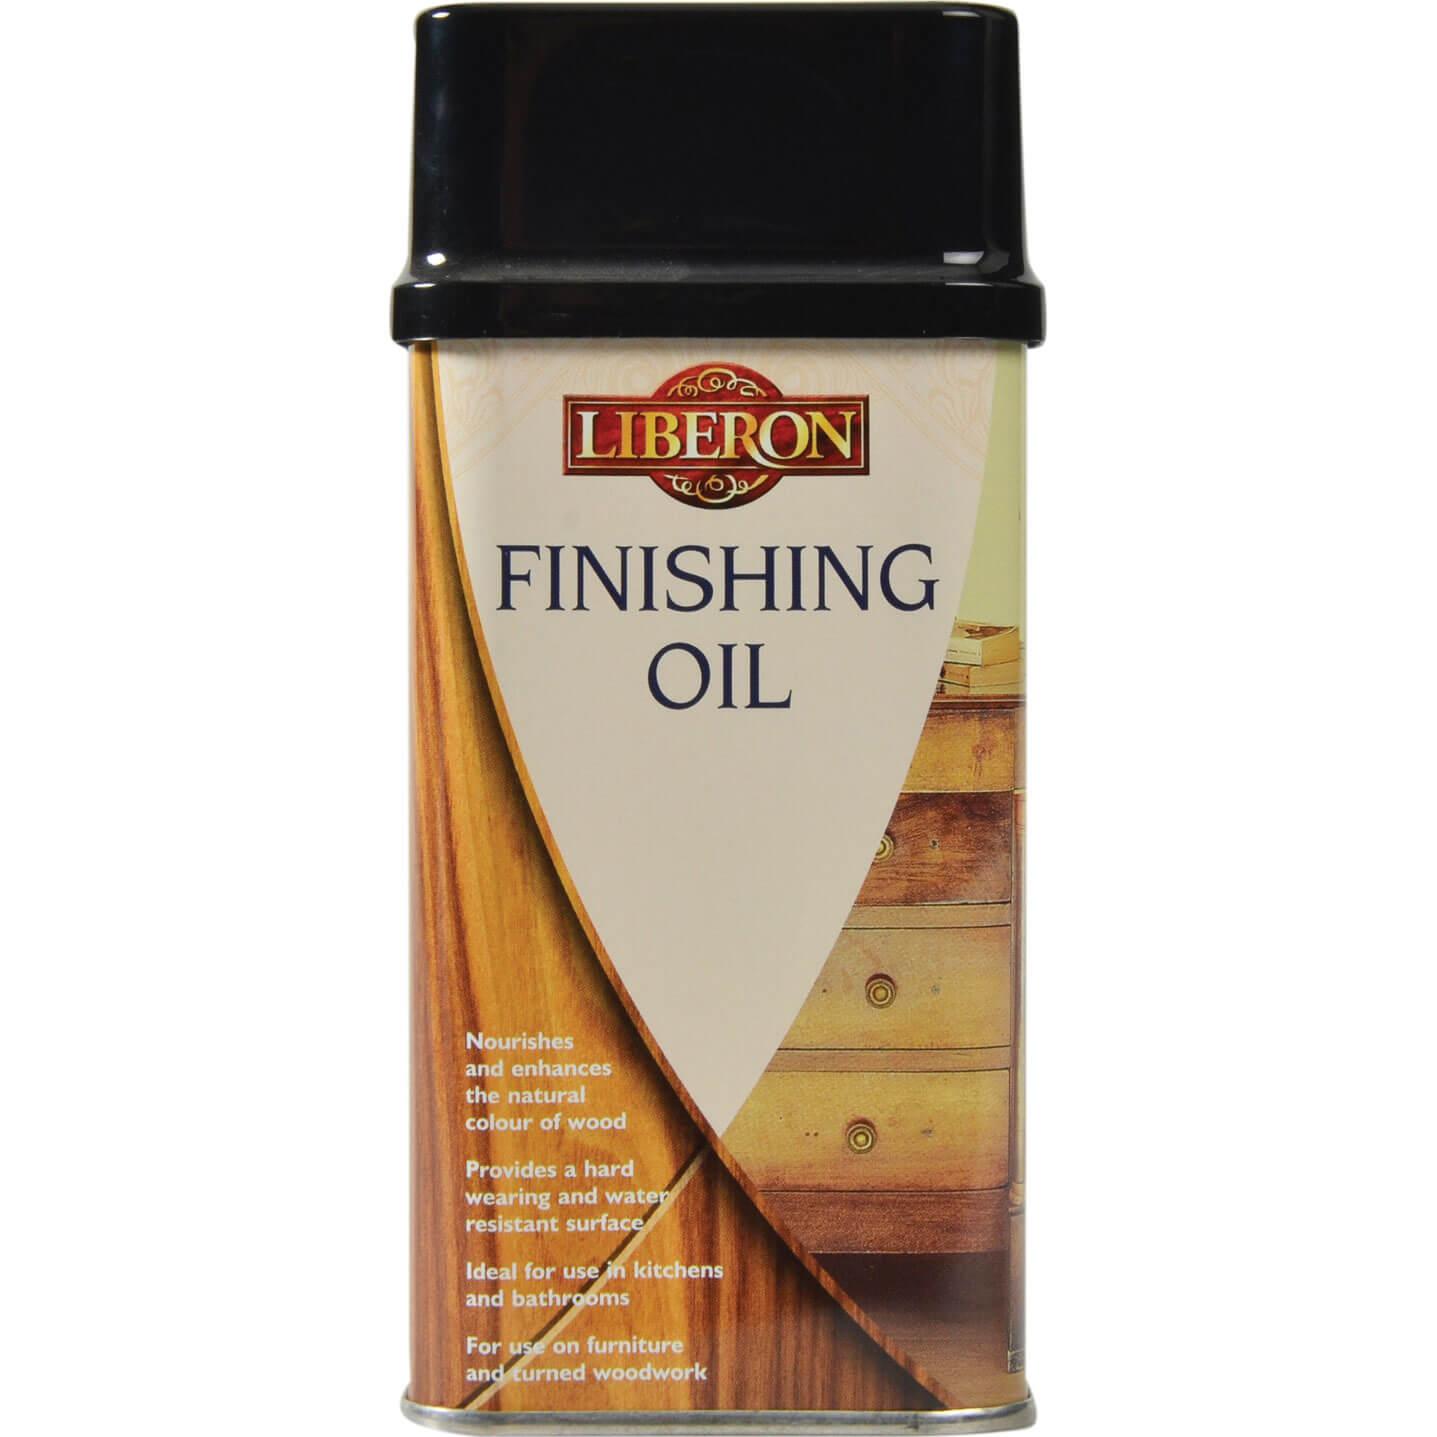 Image of Liberon Finishing Oil 250ml